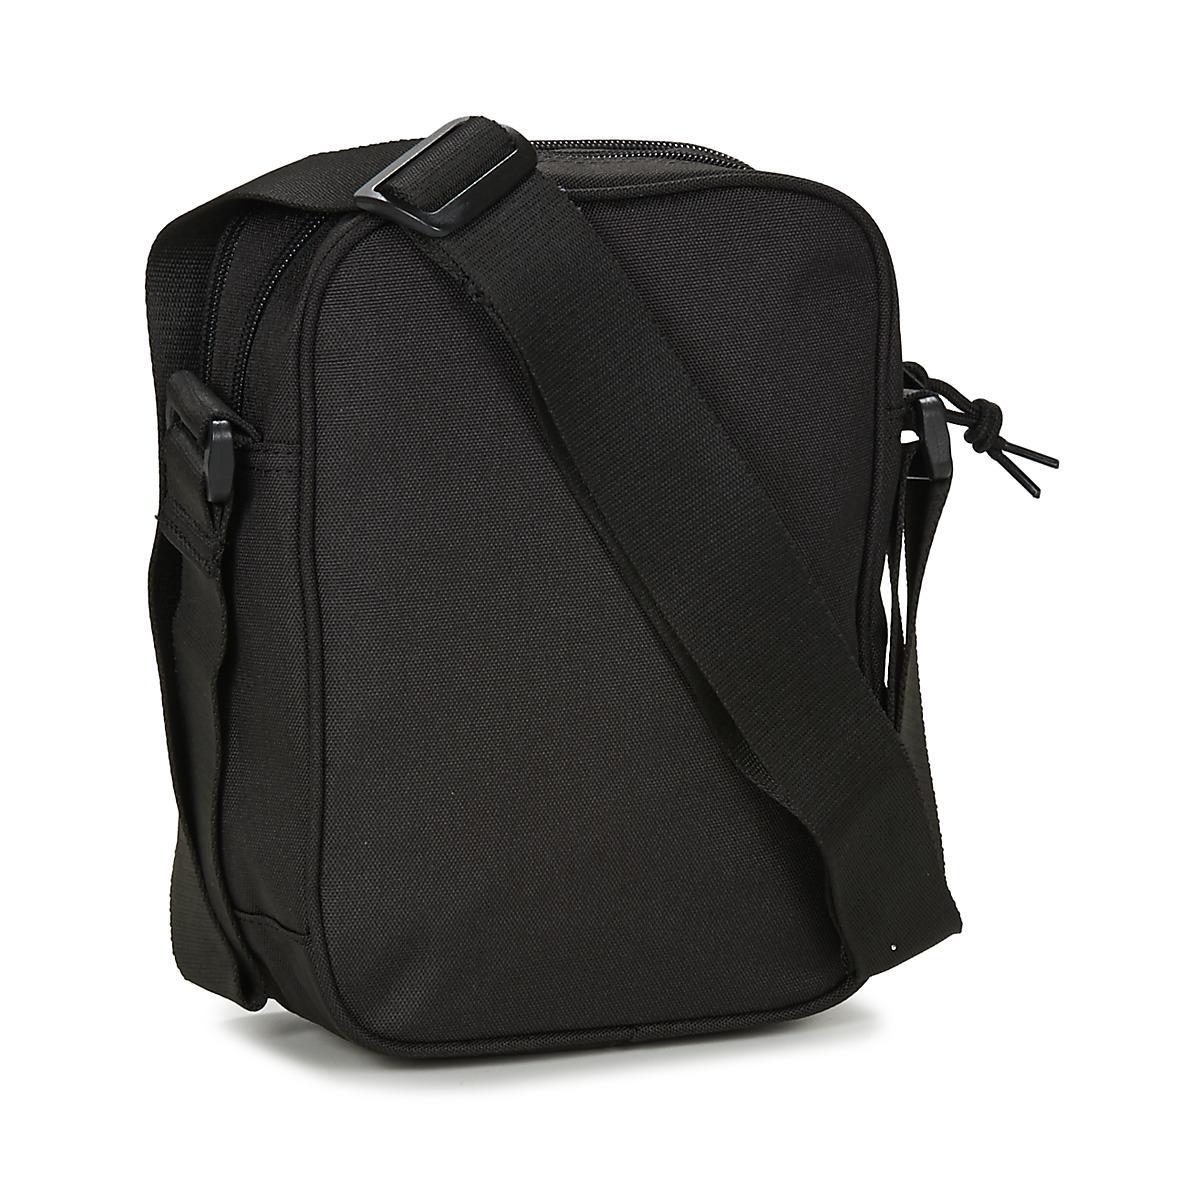 dd86c53880 Converse - Core Poly Cross Body Men s Pouch In Black for Men - Lyst. View  fullscreen